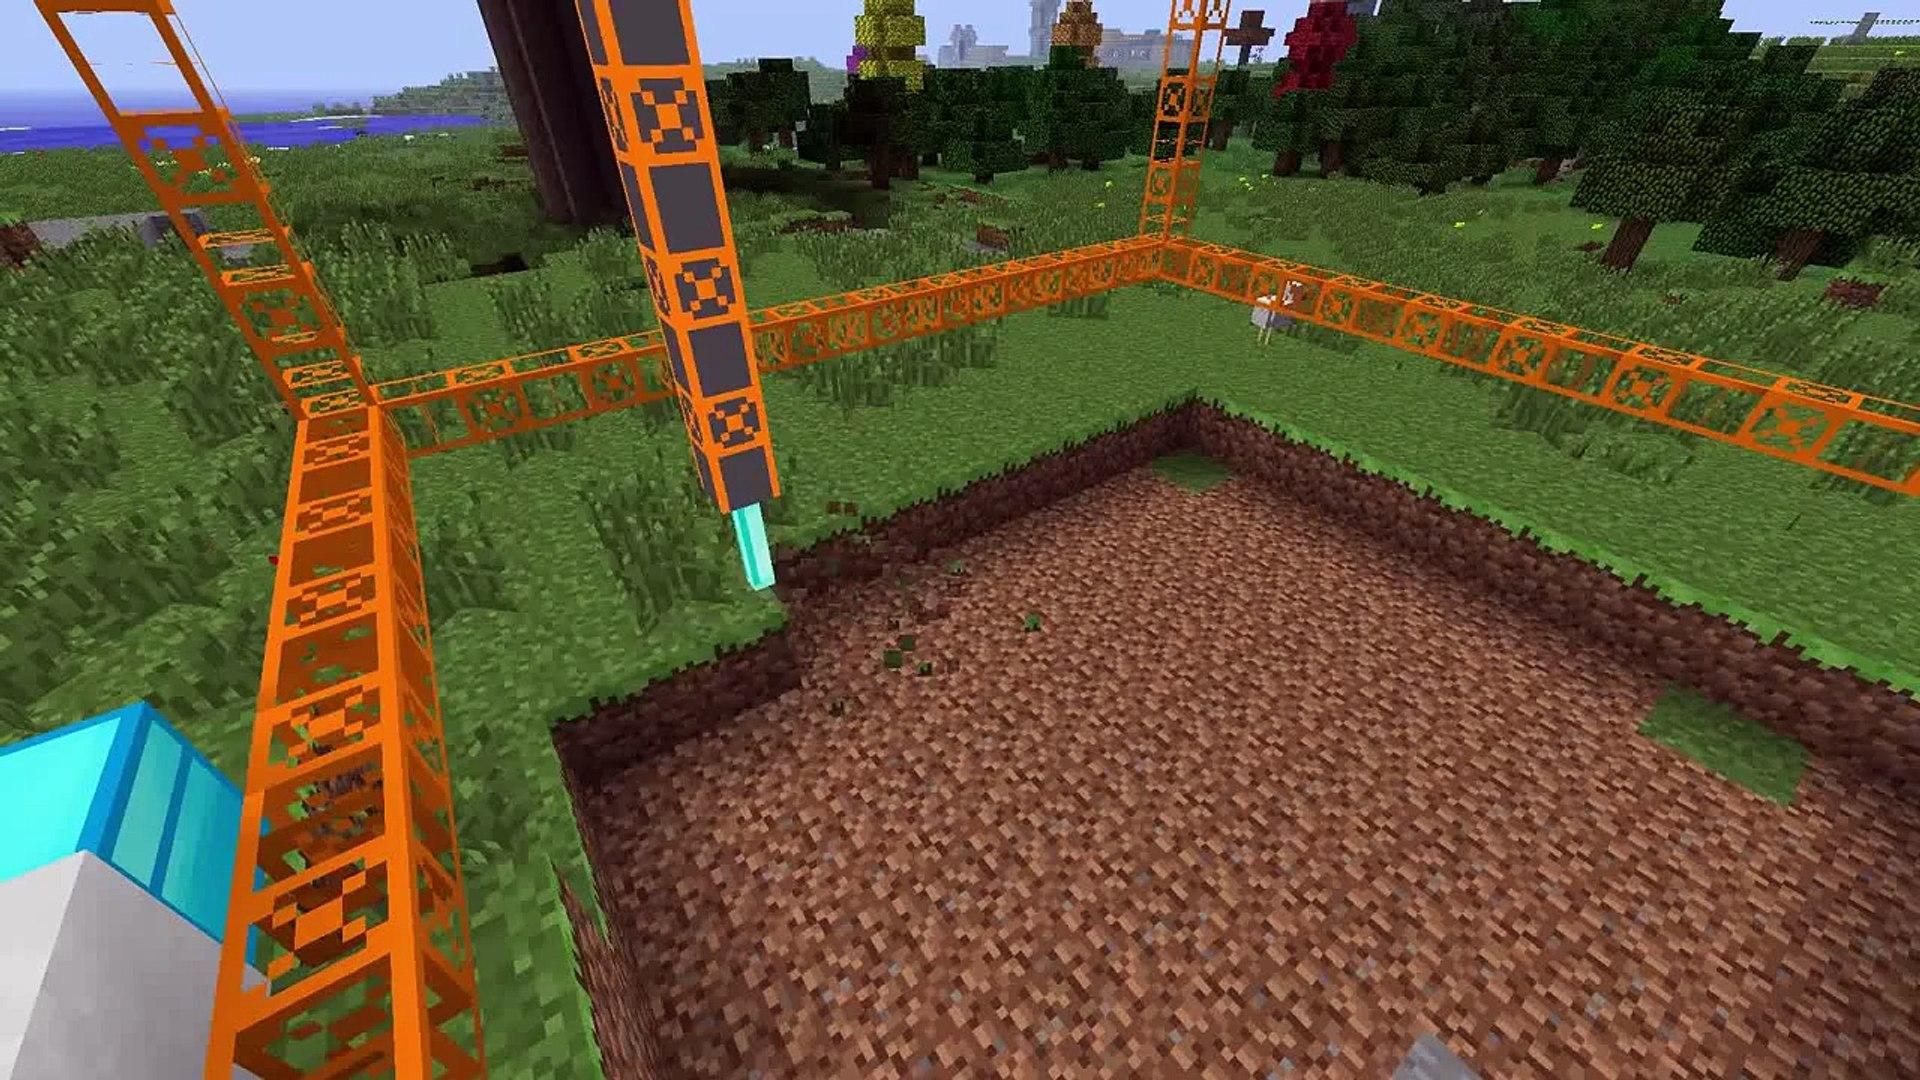 Buildcraft Quarry Full Setup Tekkit Feed The Beast Minecraft In